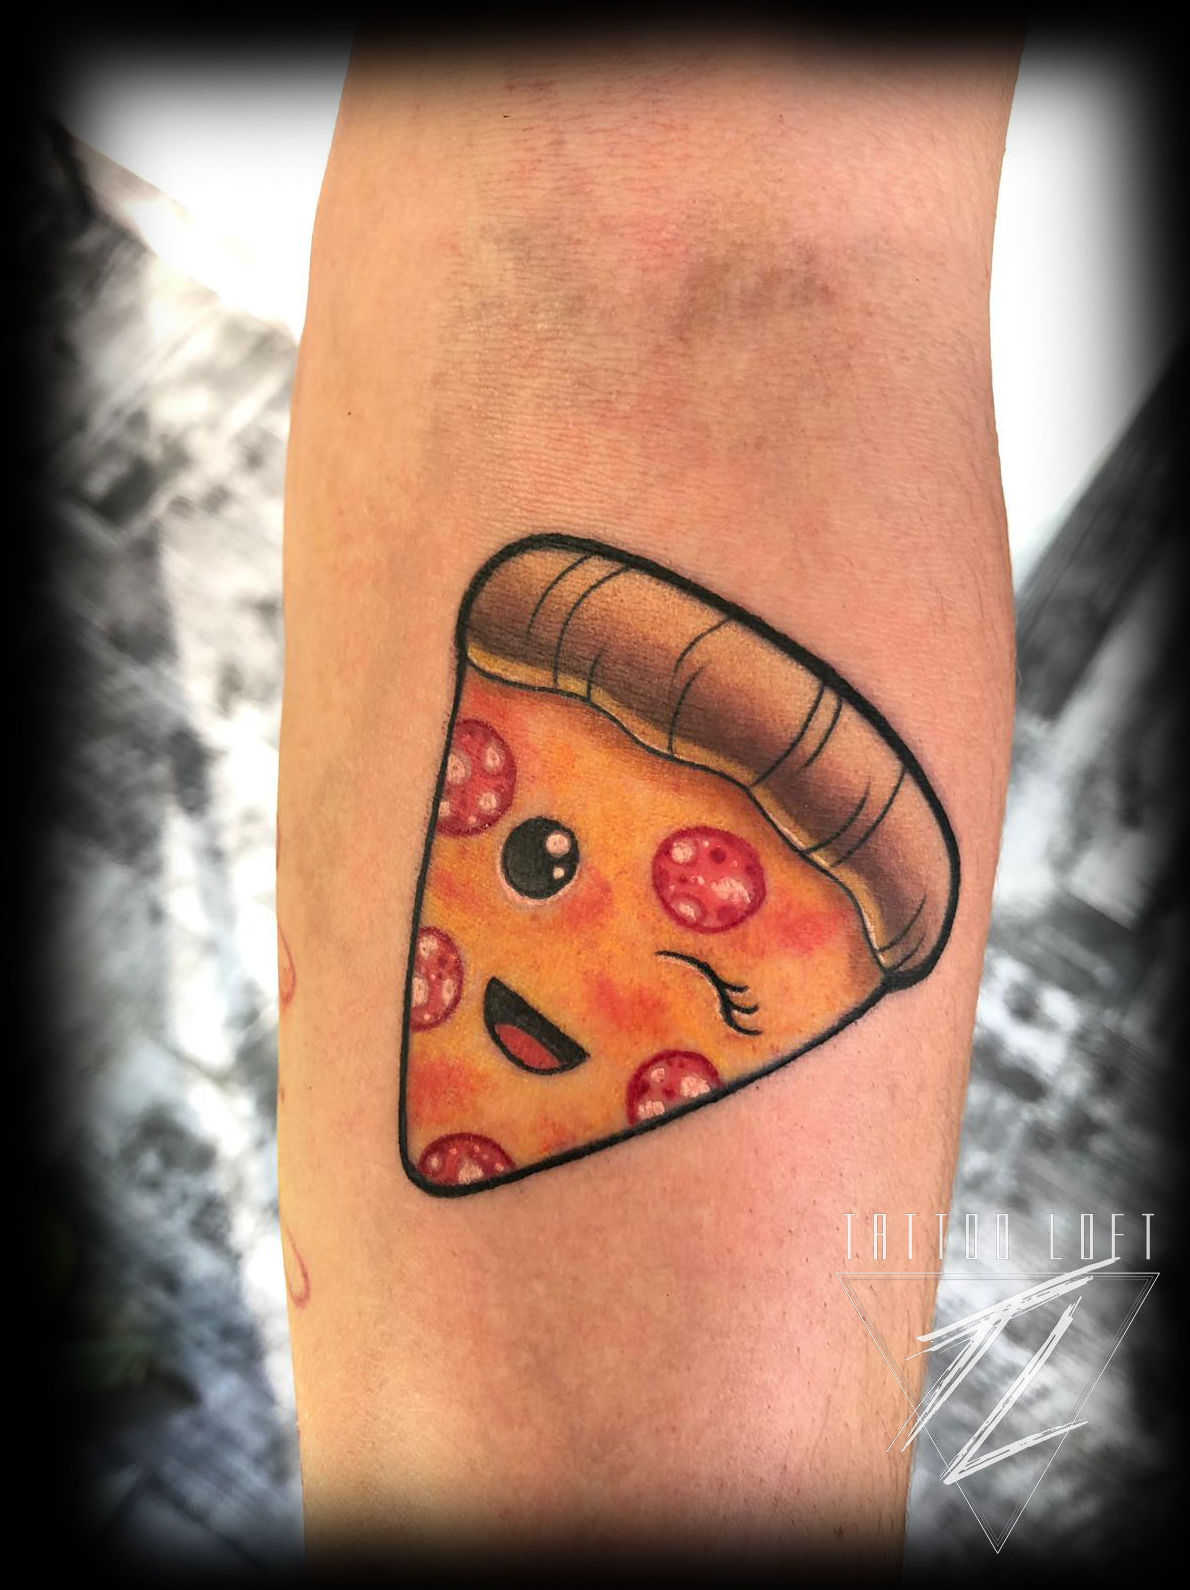 Foto 48 de Estudio artístico de tatuaje en  | Tattoo Loft